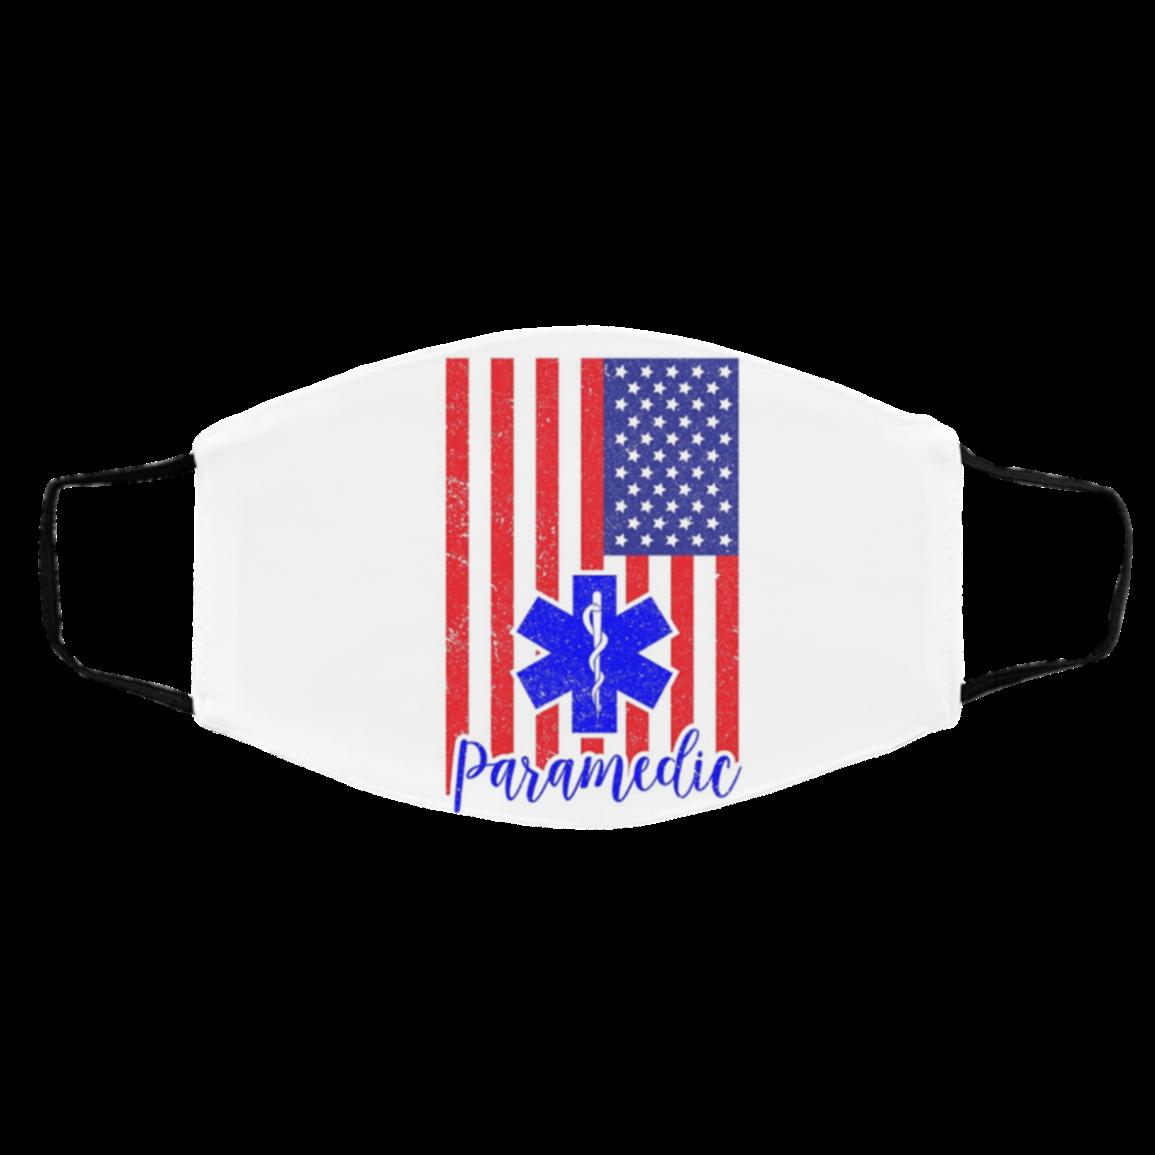 American Flag EMT Paramedic and Medic Filter Face Mask